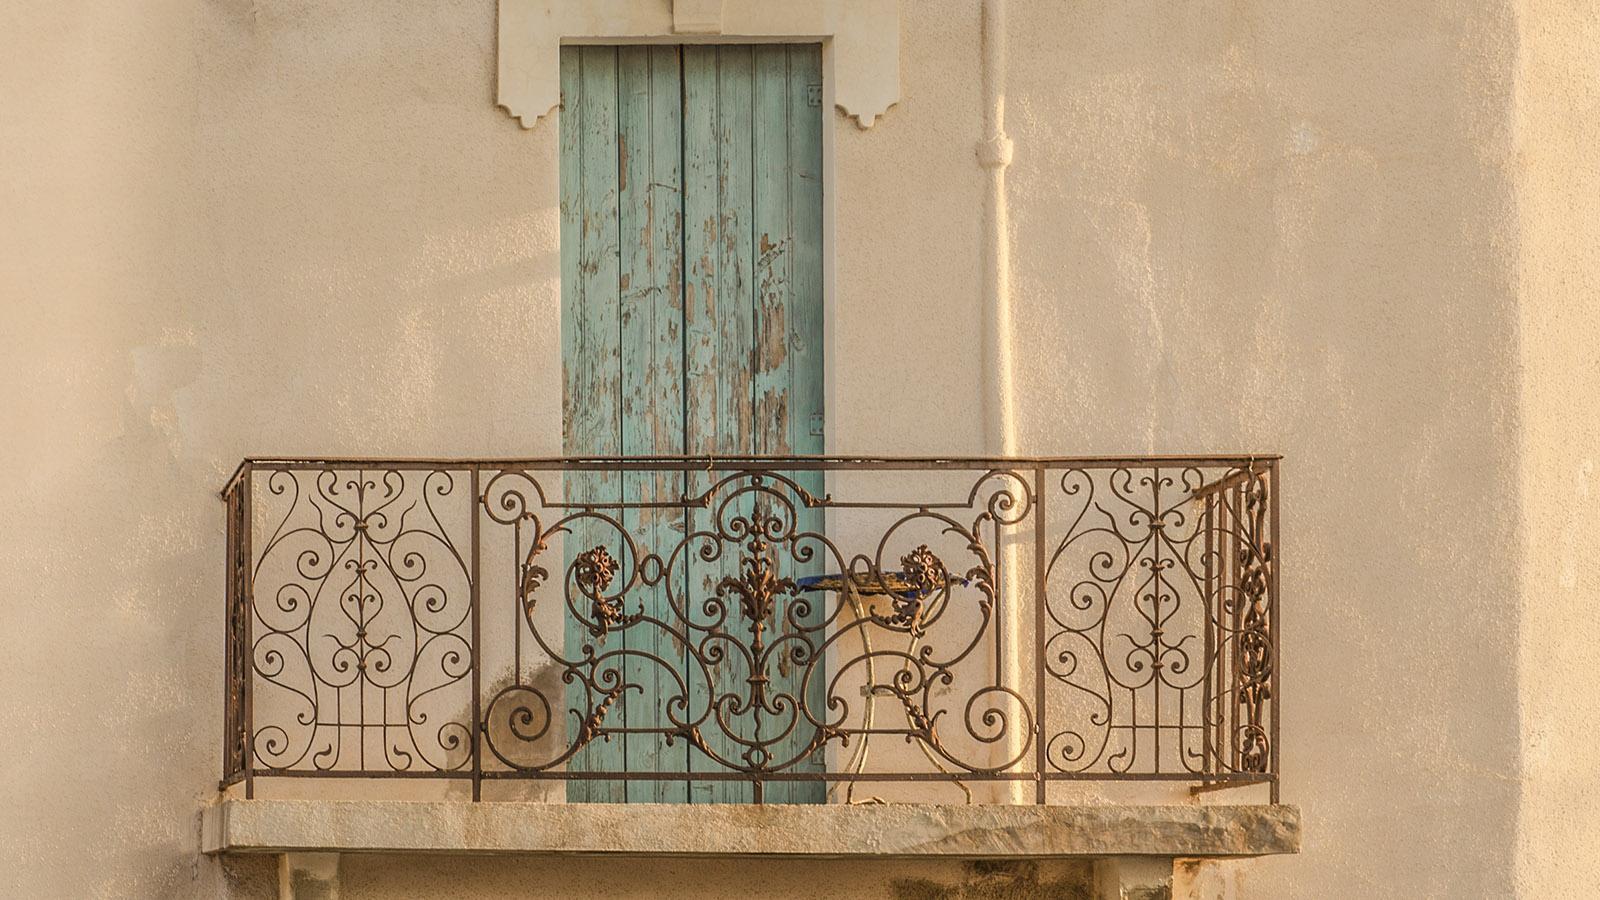 Banyuls: Balkon in der Altstadt. Foto: Hilke Maunder